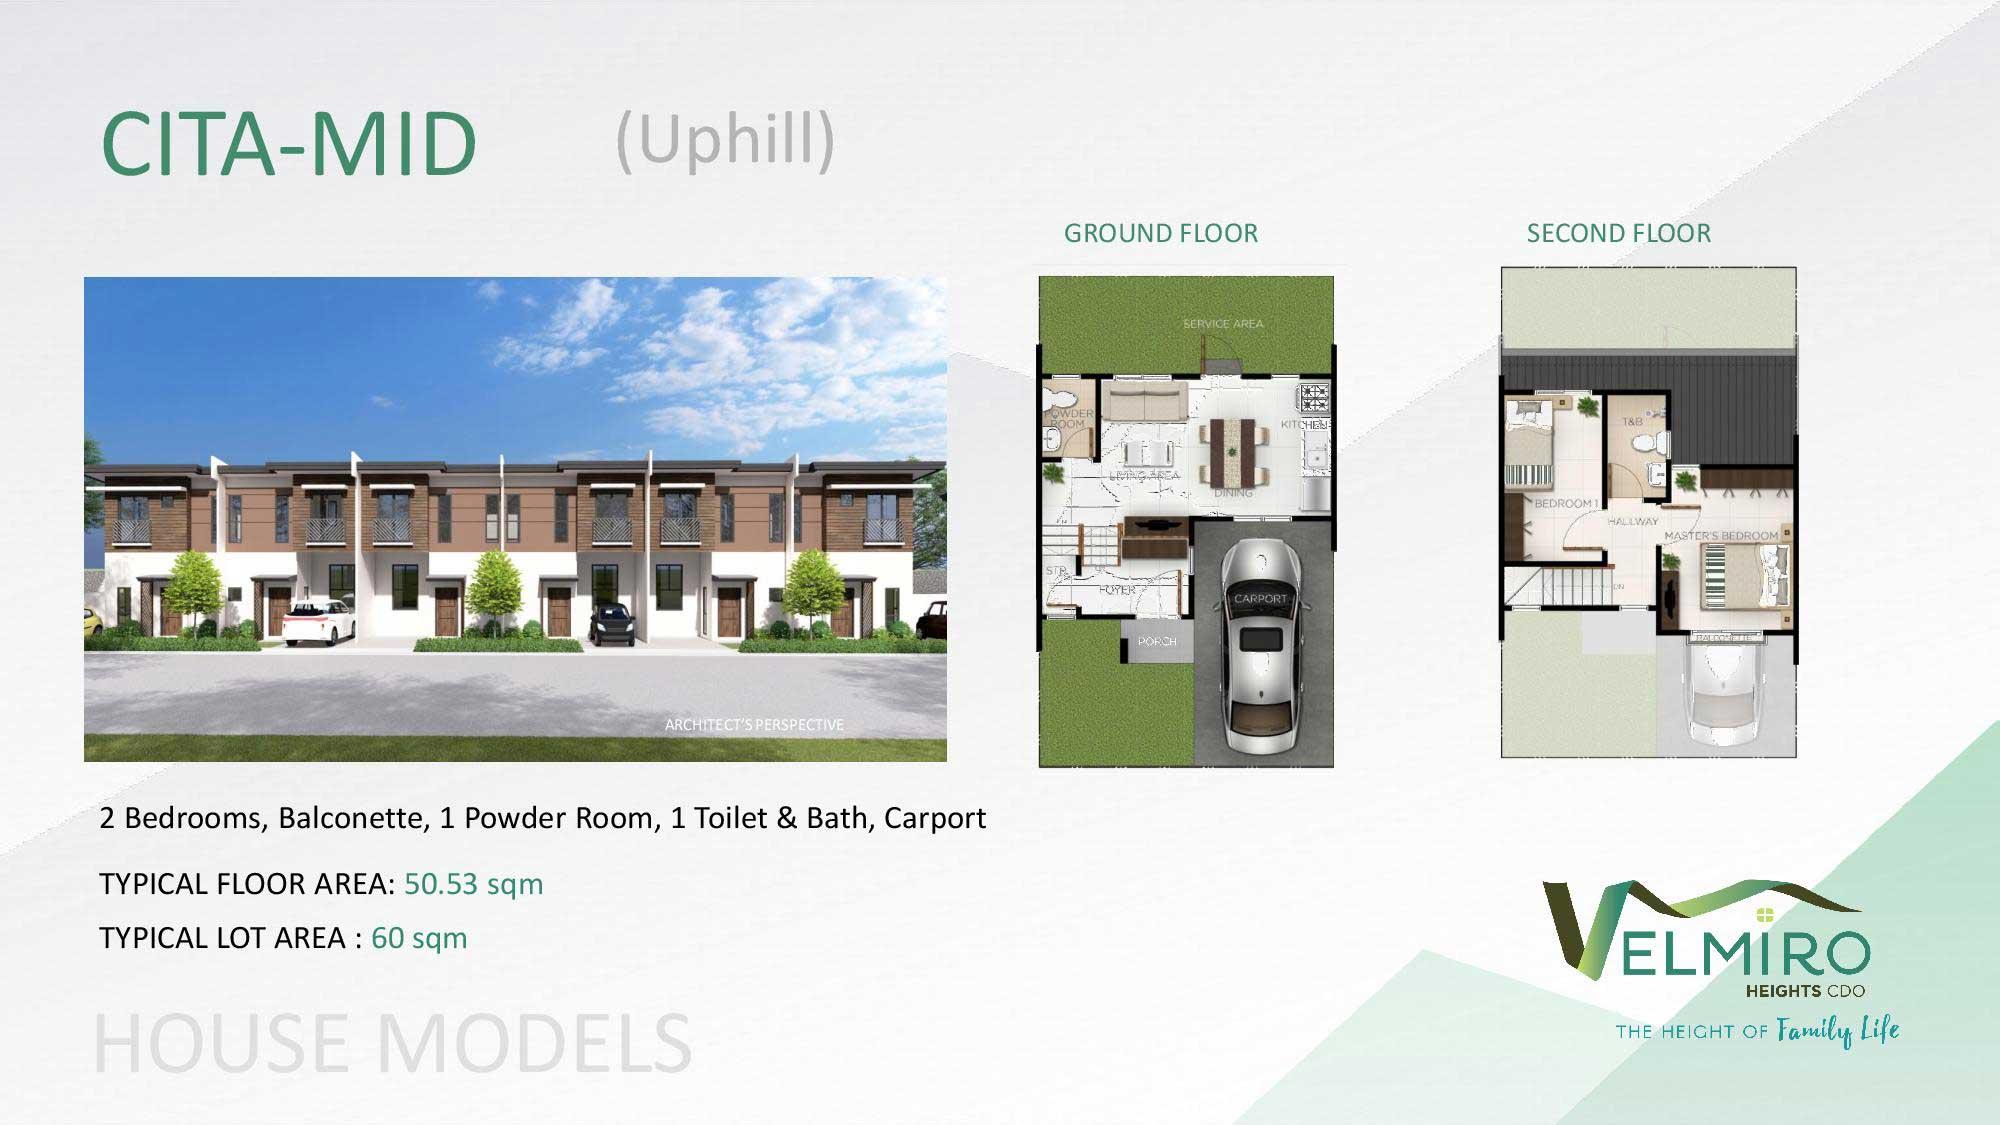 Velmiro heights agusan house model cita mid uphill web gmc